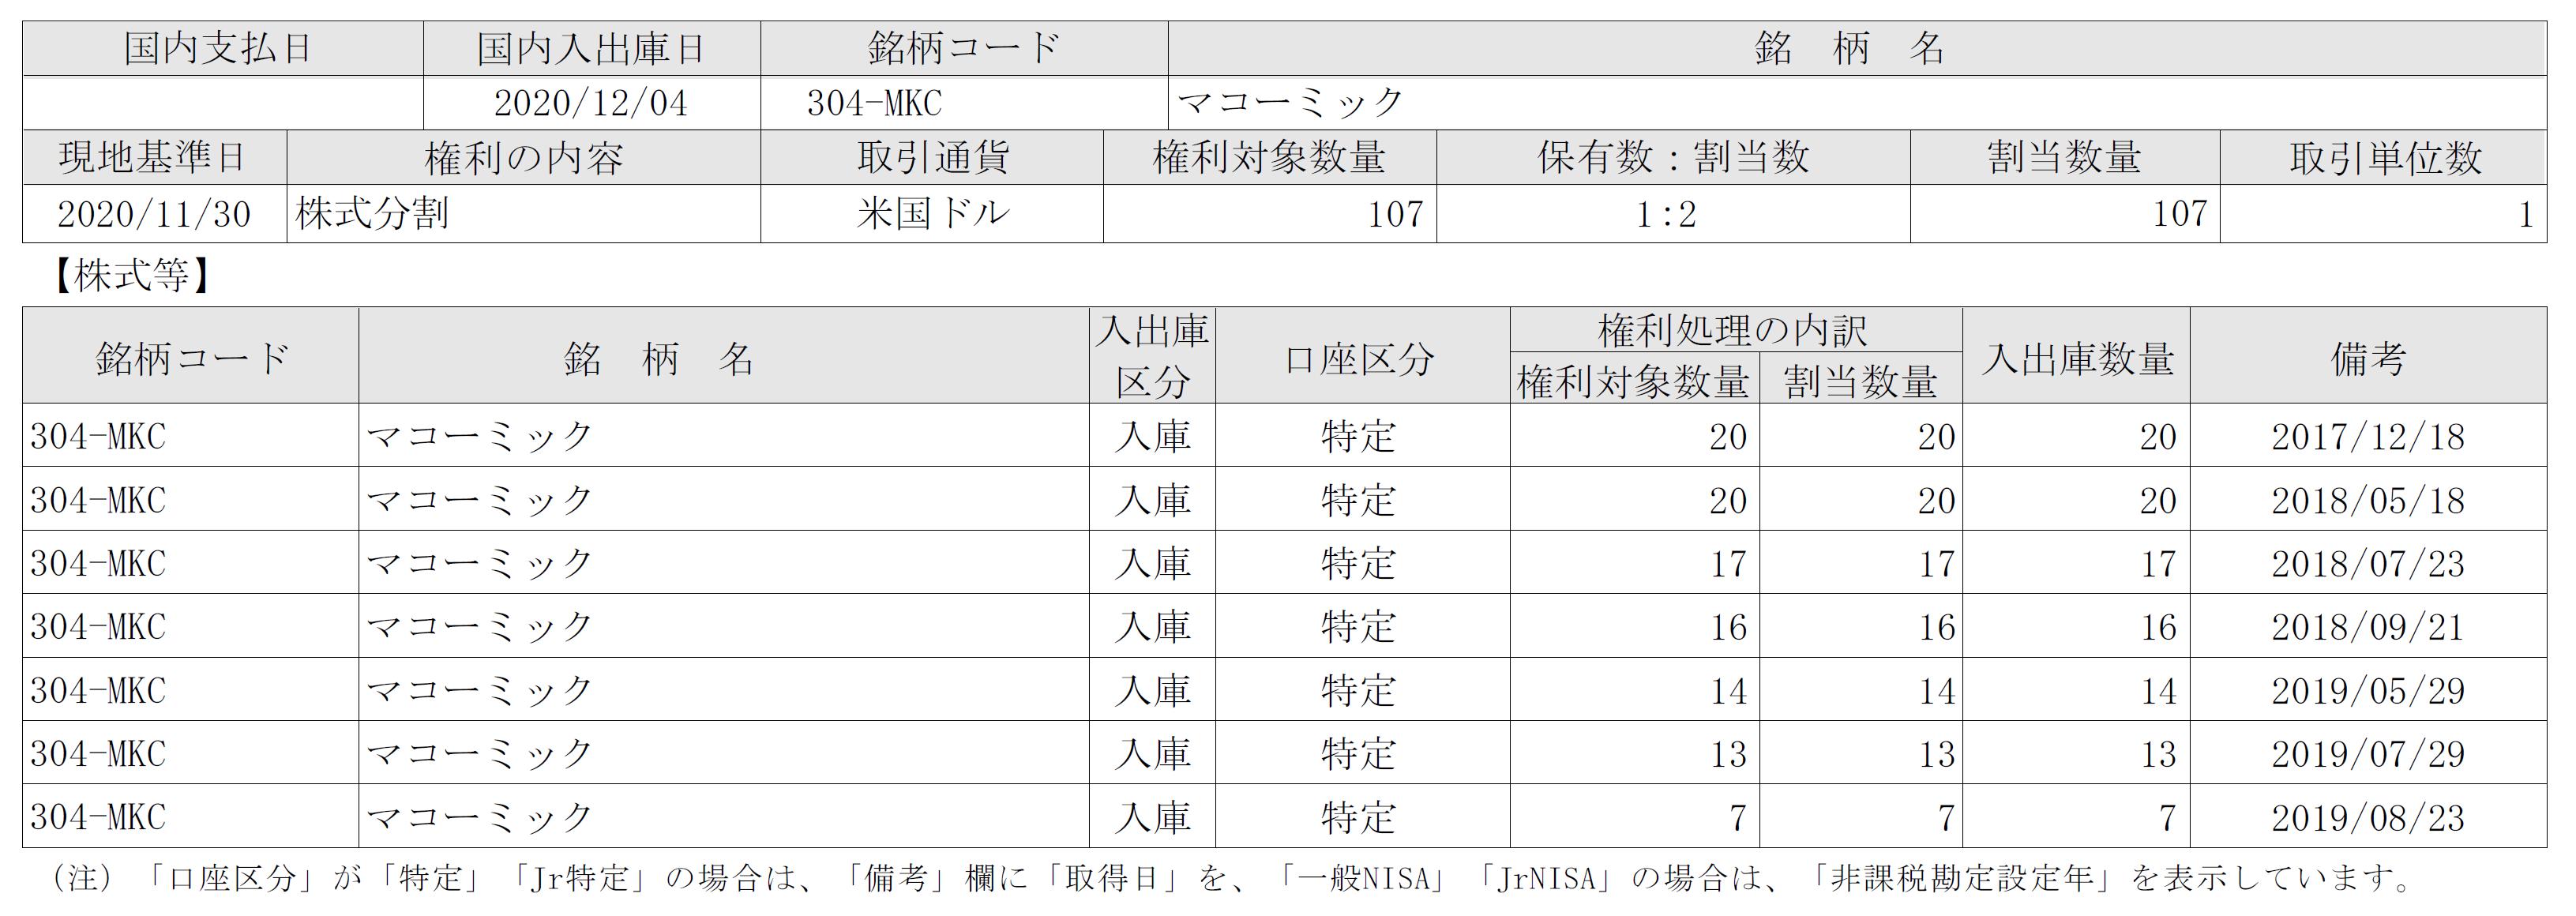 f:id:hodo-work:20201208105710p:plain